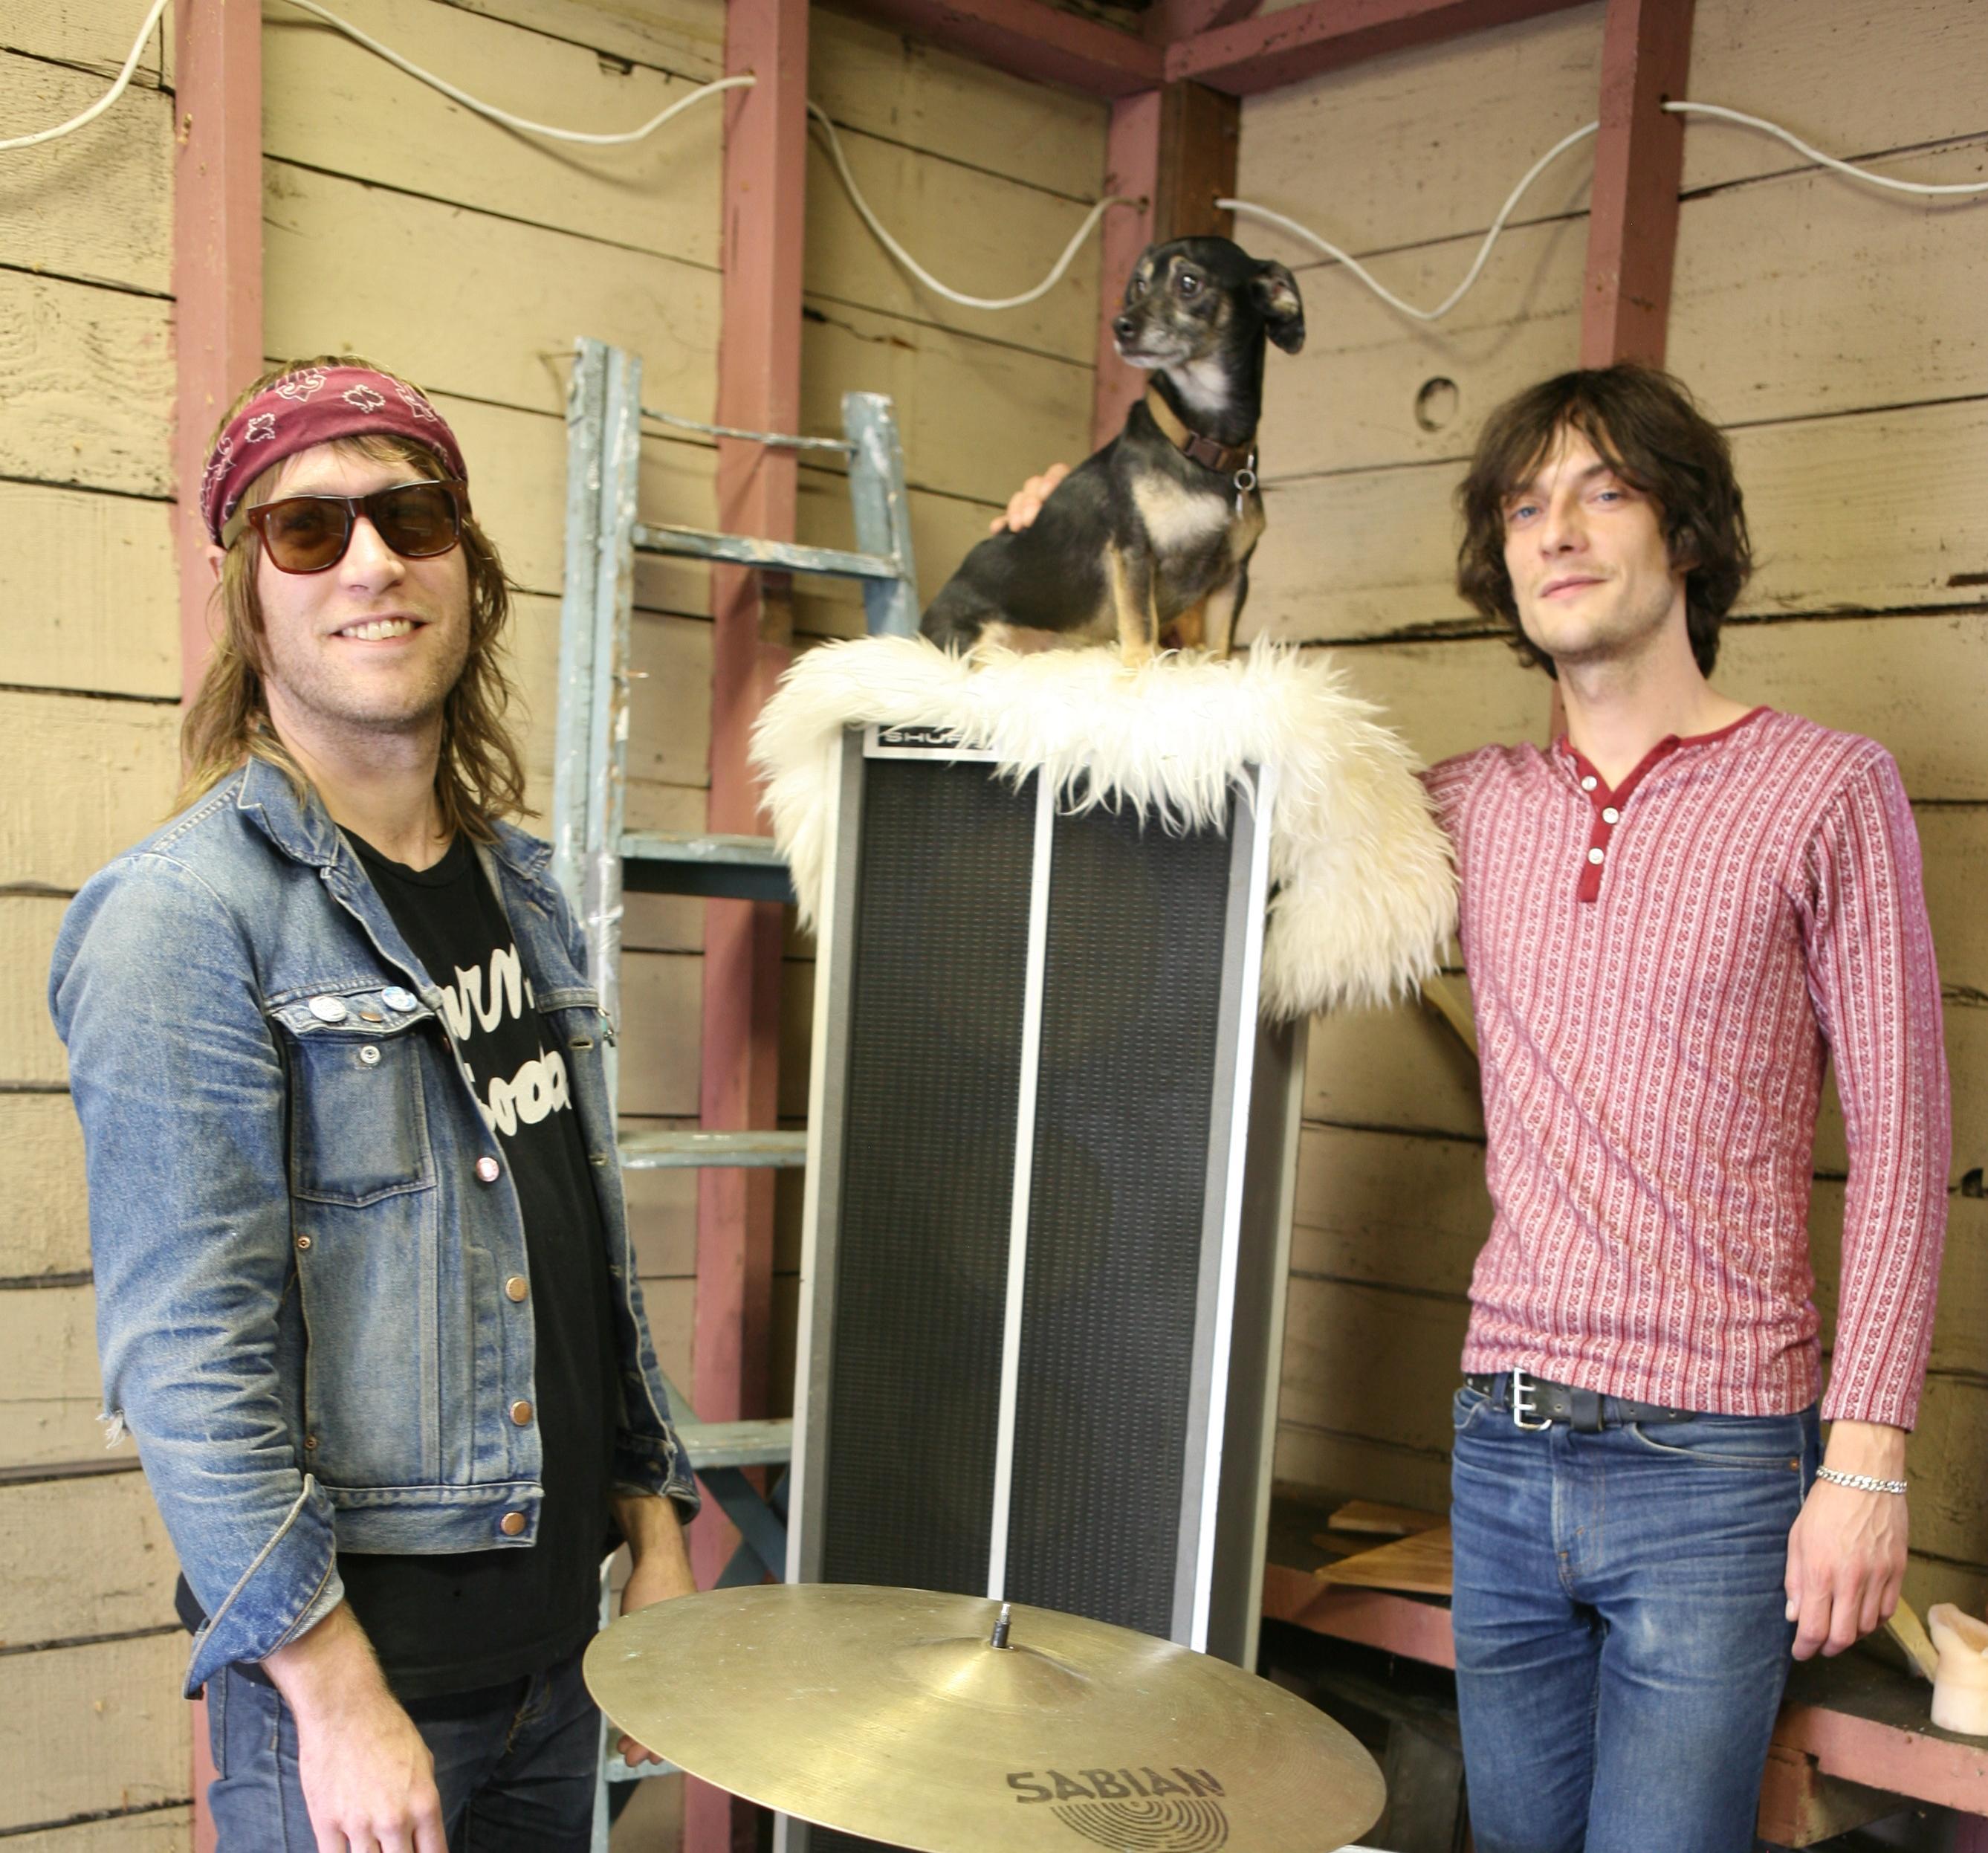 L-R: Shane, Boopis, Lars